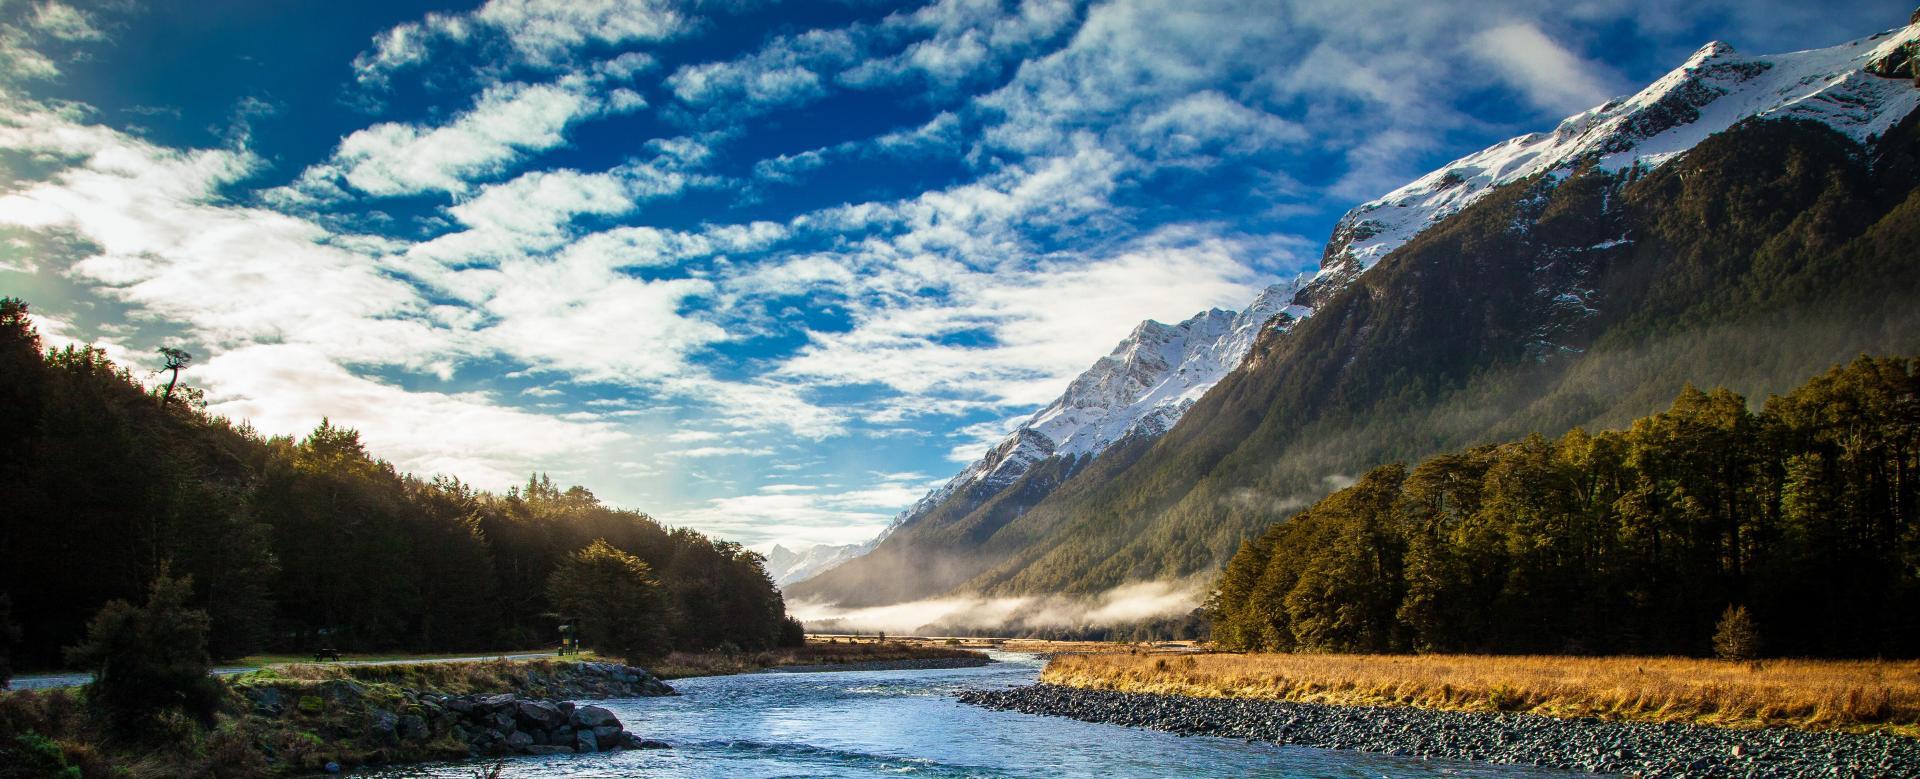 Voyage à pied : Trek en terre maorie